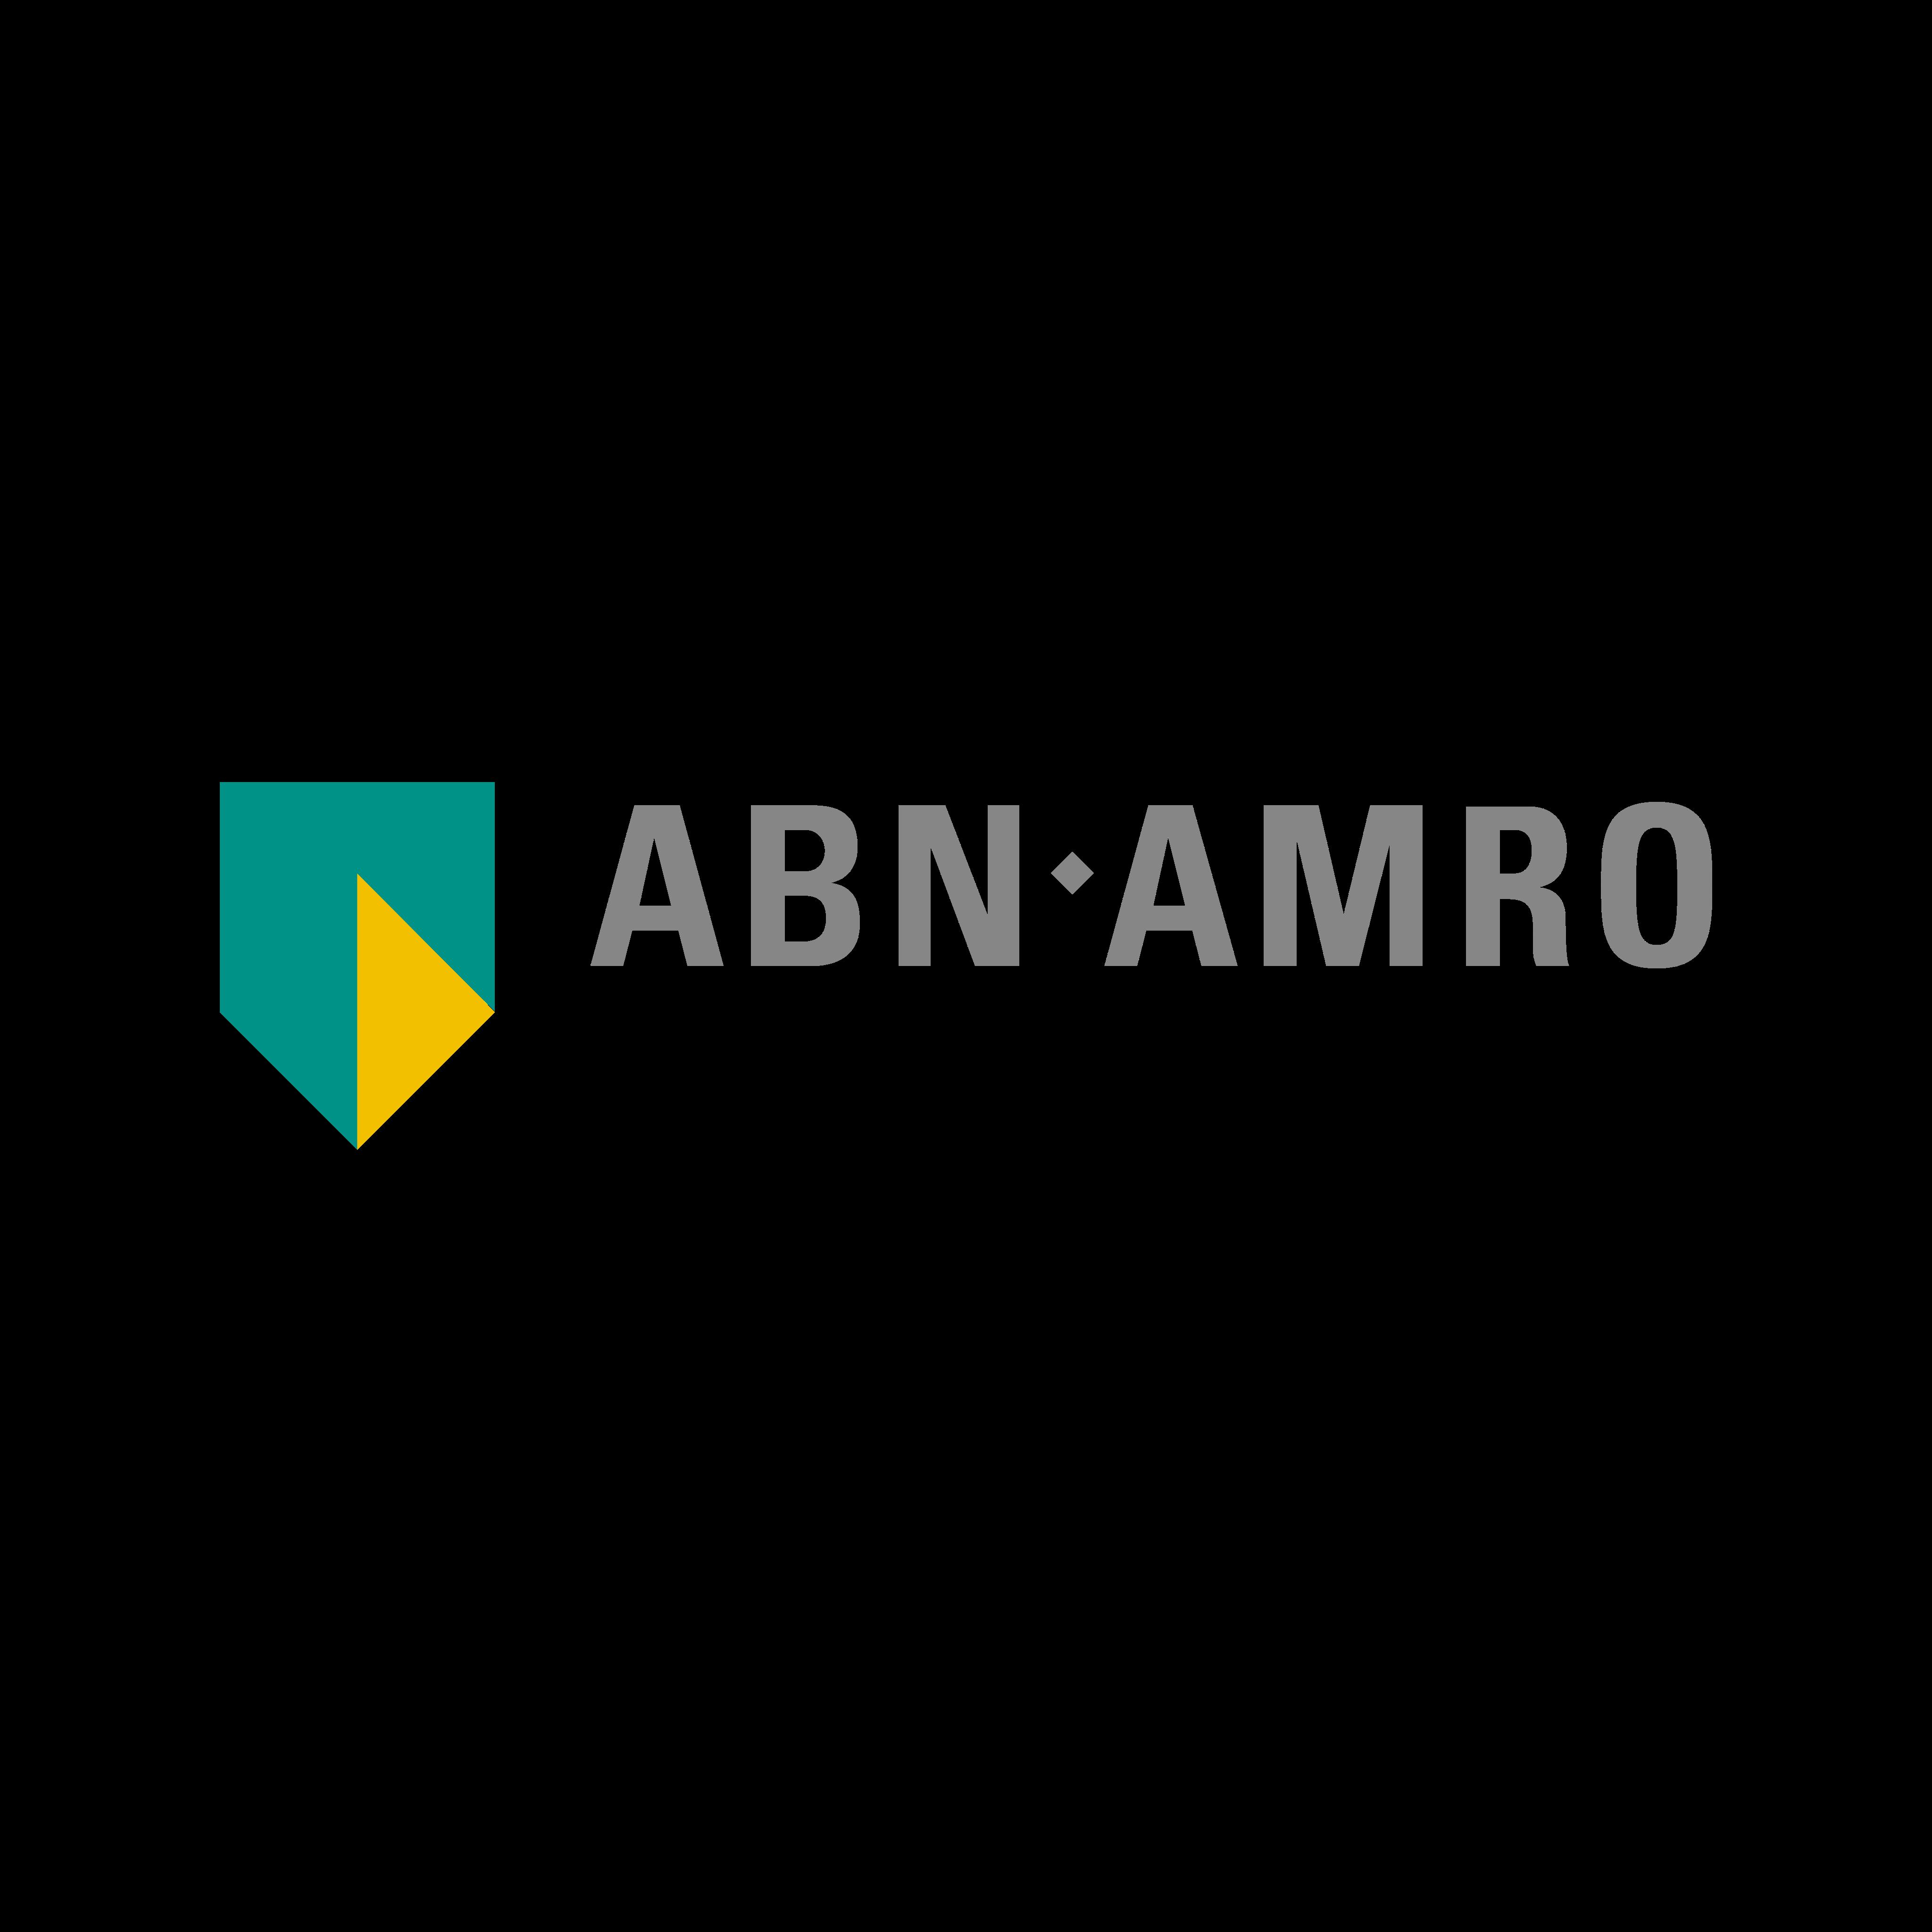 abn amro logo 0 - ABN AMRO Logo